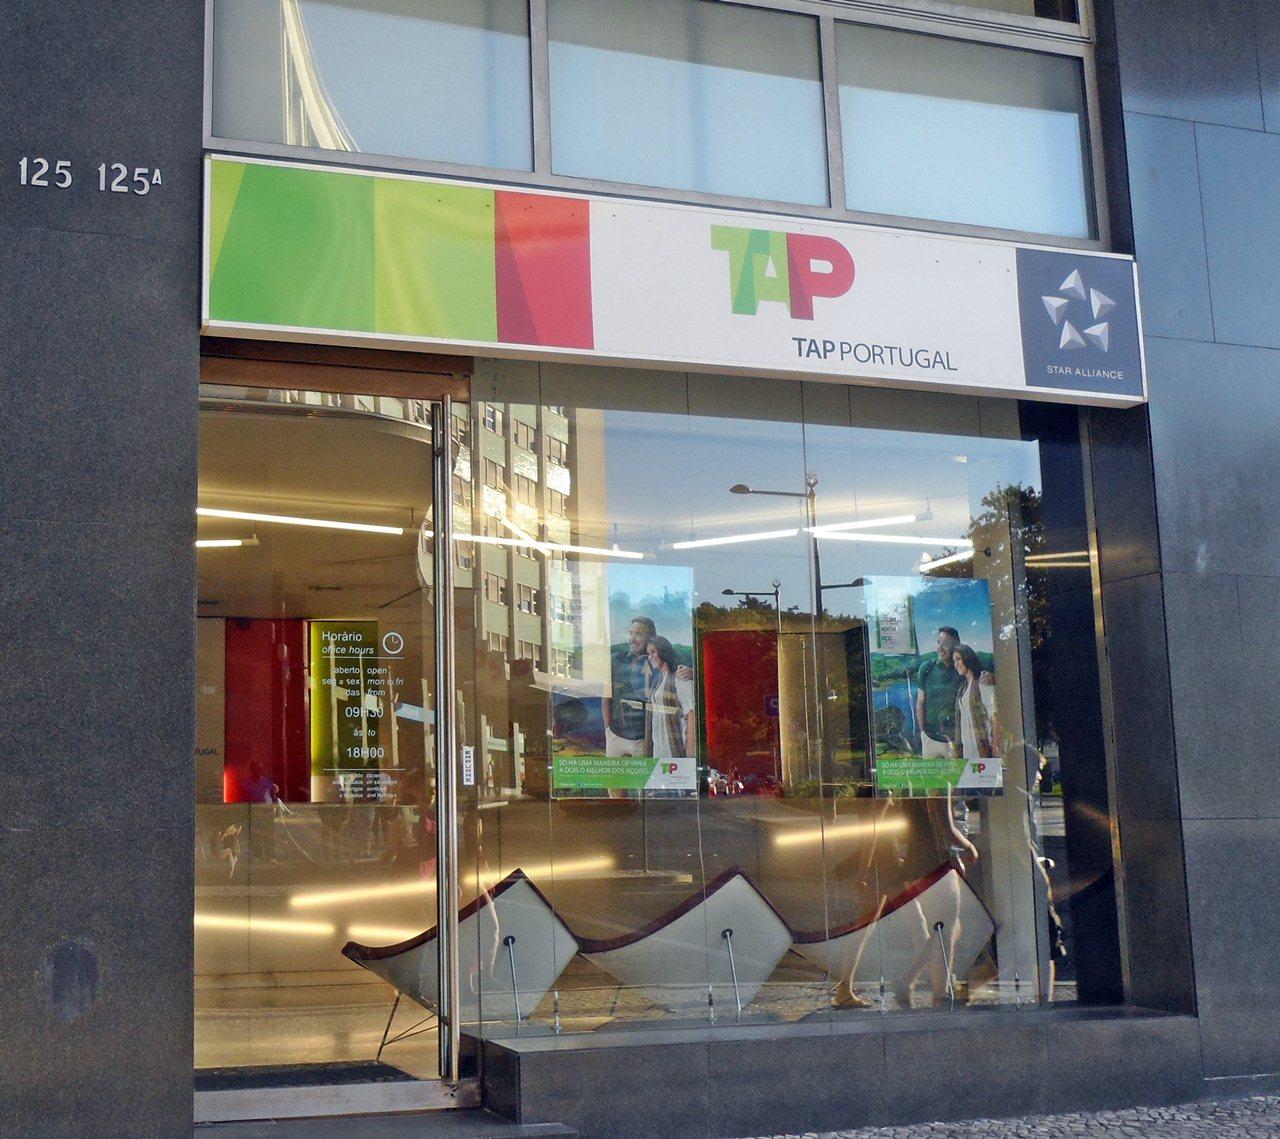 Loja TAP Portugal em Lisboa